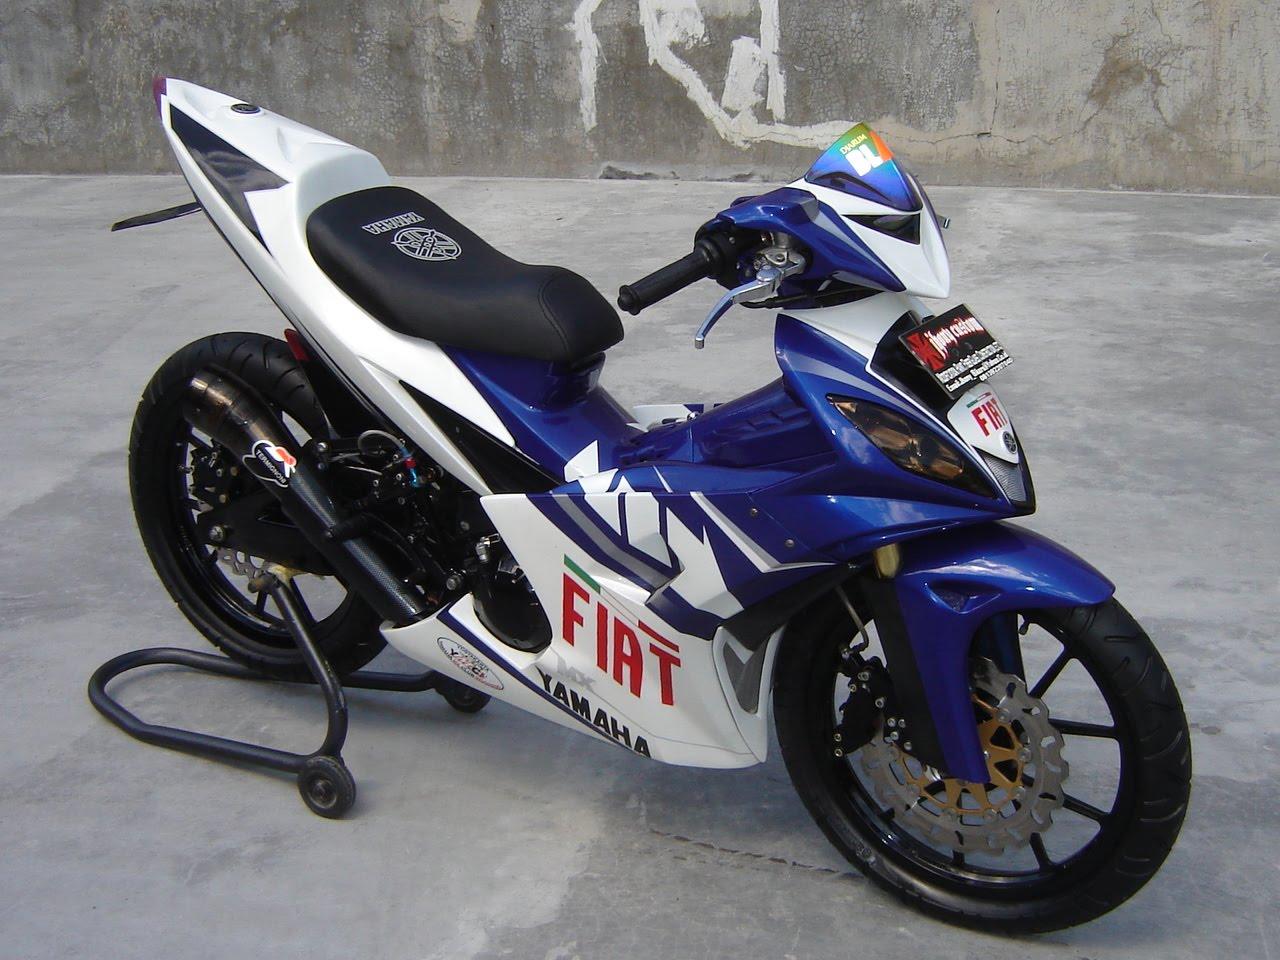 Modifikasi Motor Yamaha 2016: Modifikasi Yamaha Vega Force